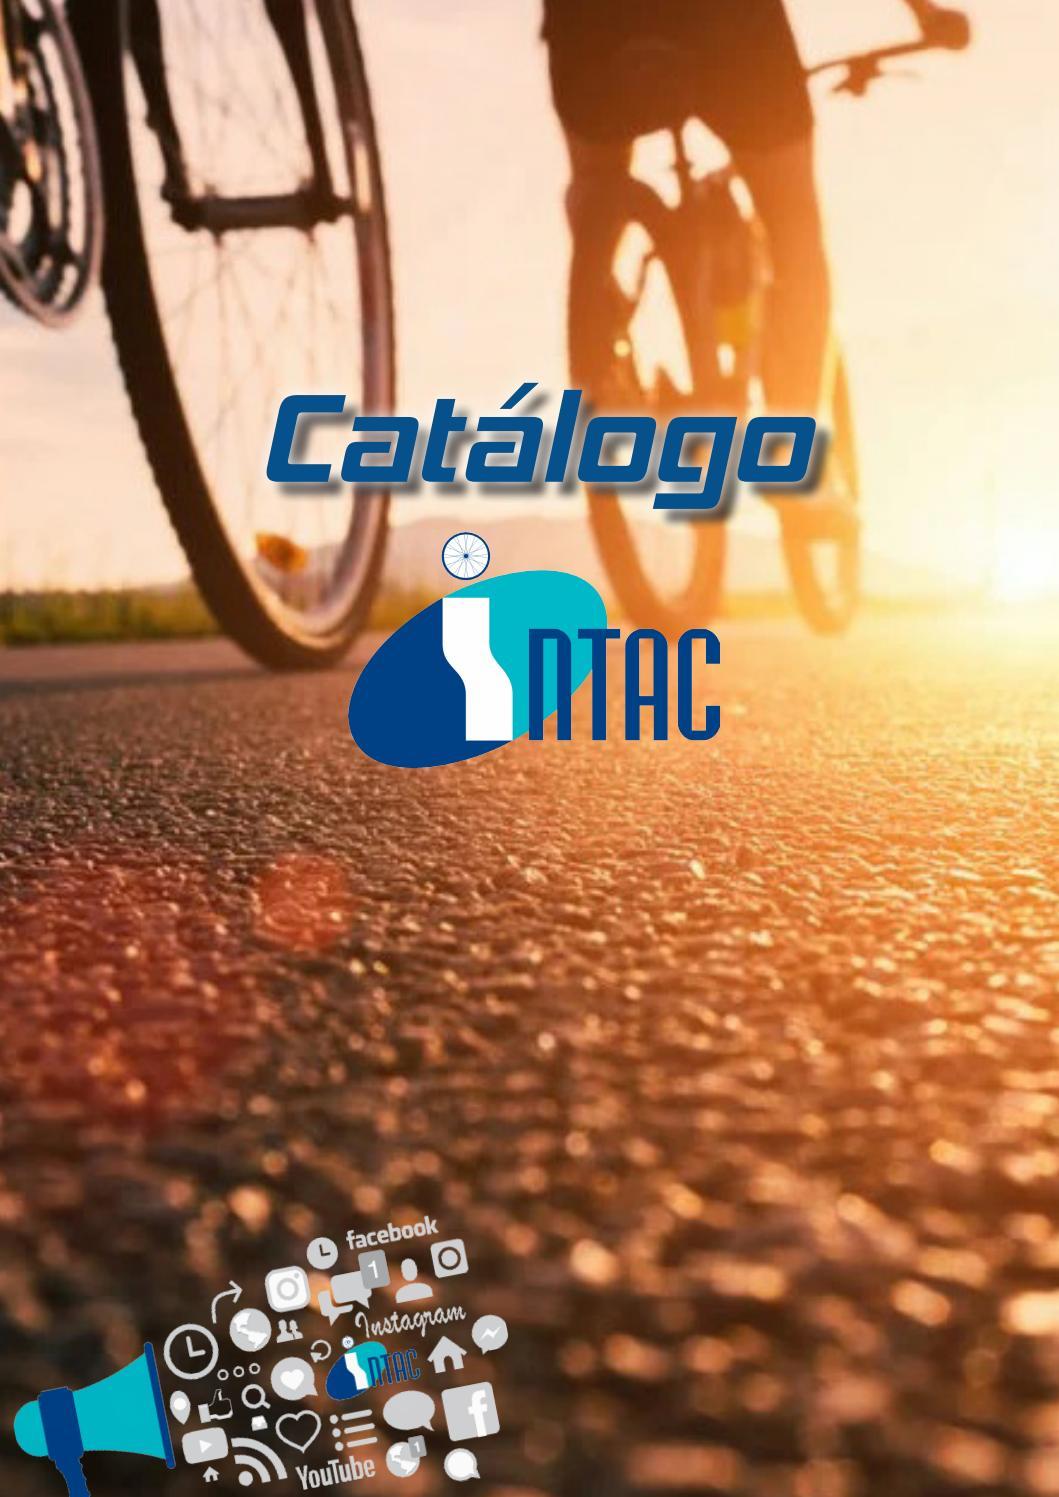 "Fone De Ouvido Bicicleta Bicicleta Tampa Superior Fone De Ouvido Haste Garfo Tampa Tampa Superior 1-1//8/"" Pés Cnc"